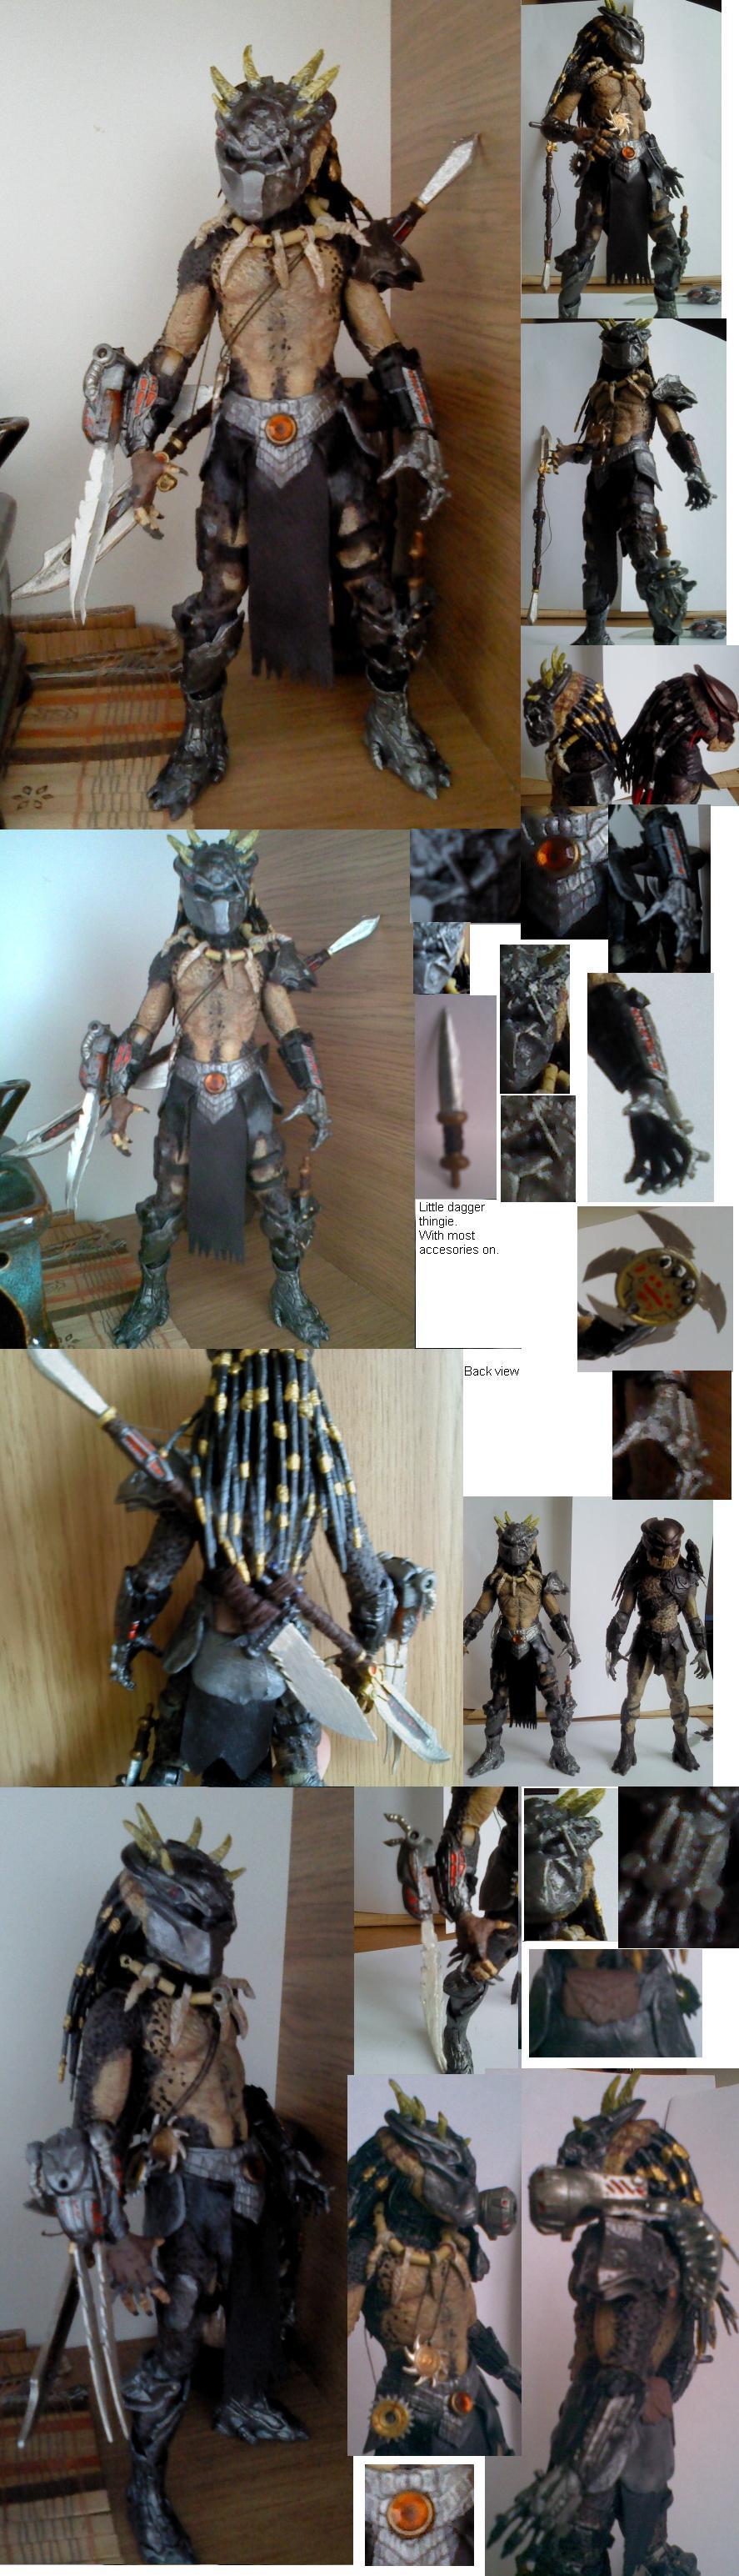 hate_predator_custom_figure_99__finished_2_by_bender18-d4yxc4w.jpg